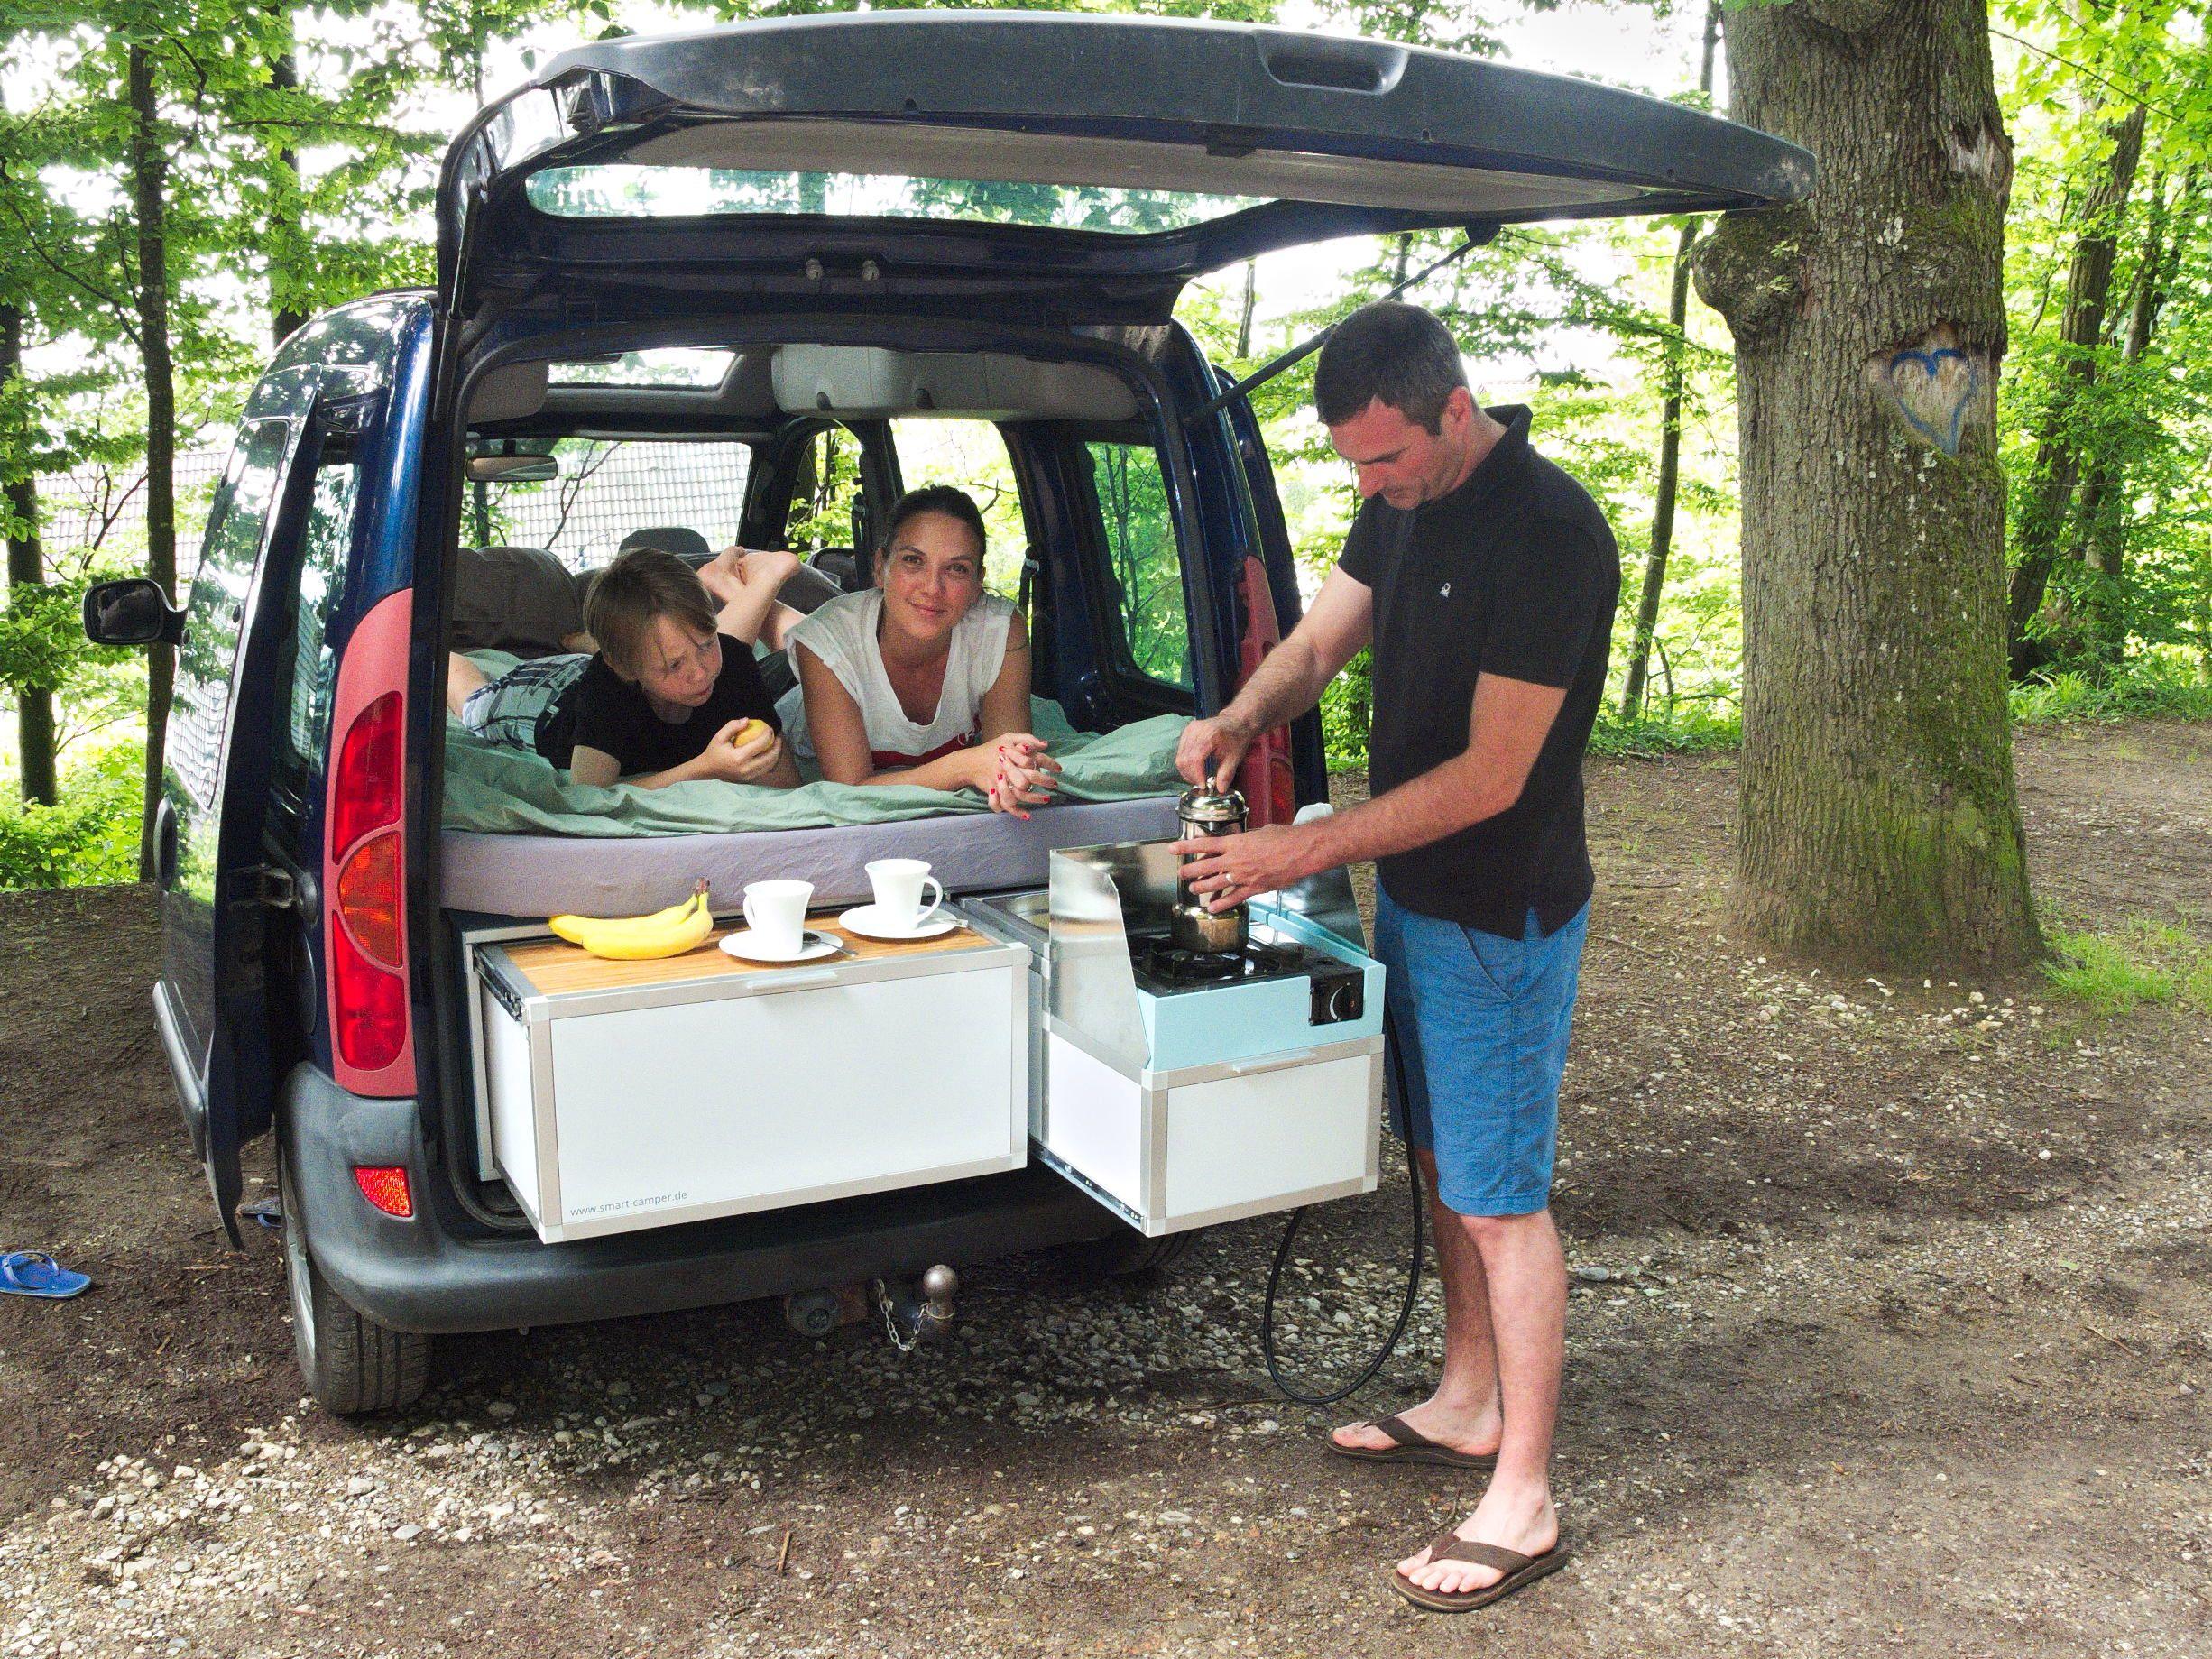 smart camper camping module f r minivans und. Black Bedroom Furniture Sets. Home Design Ideas